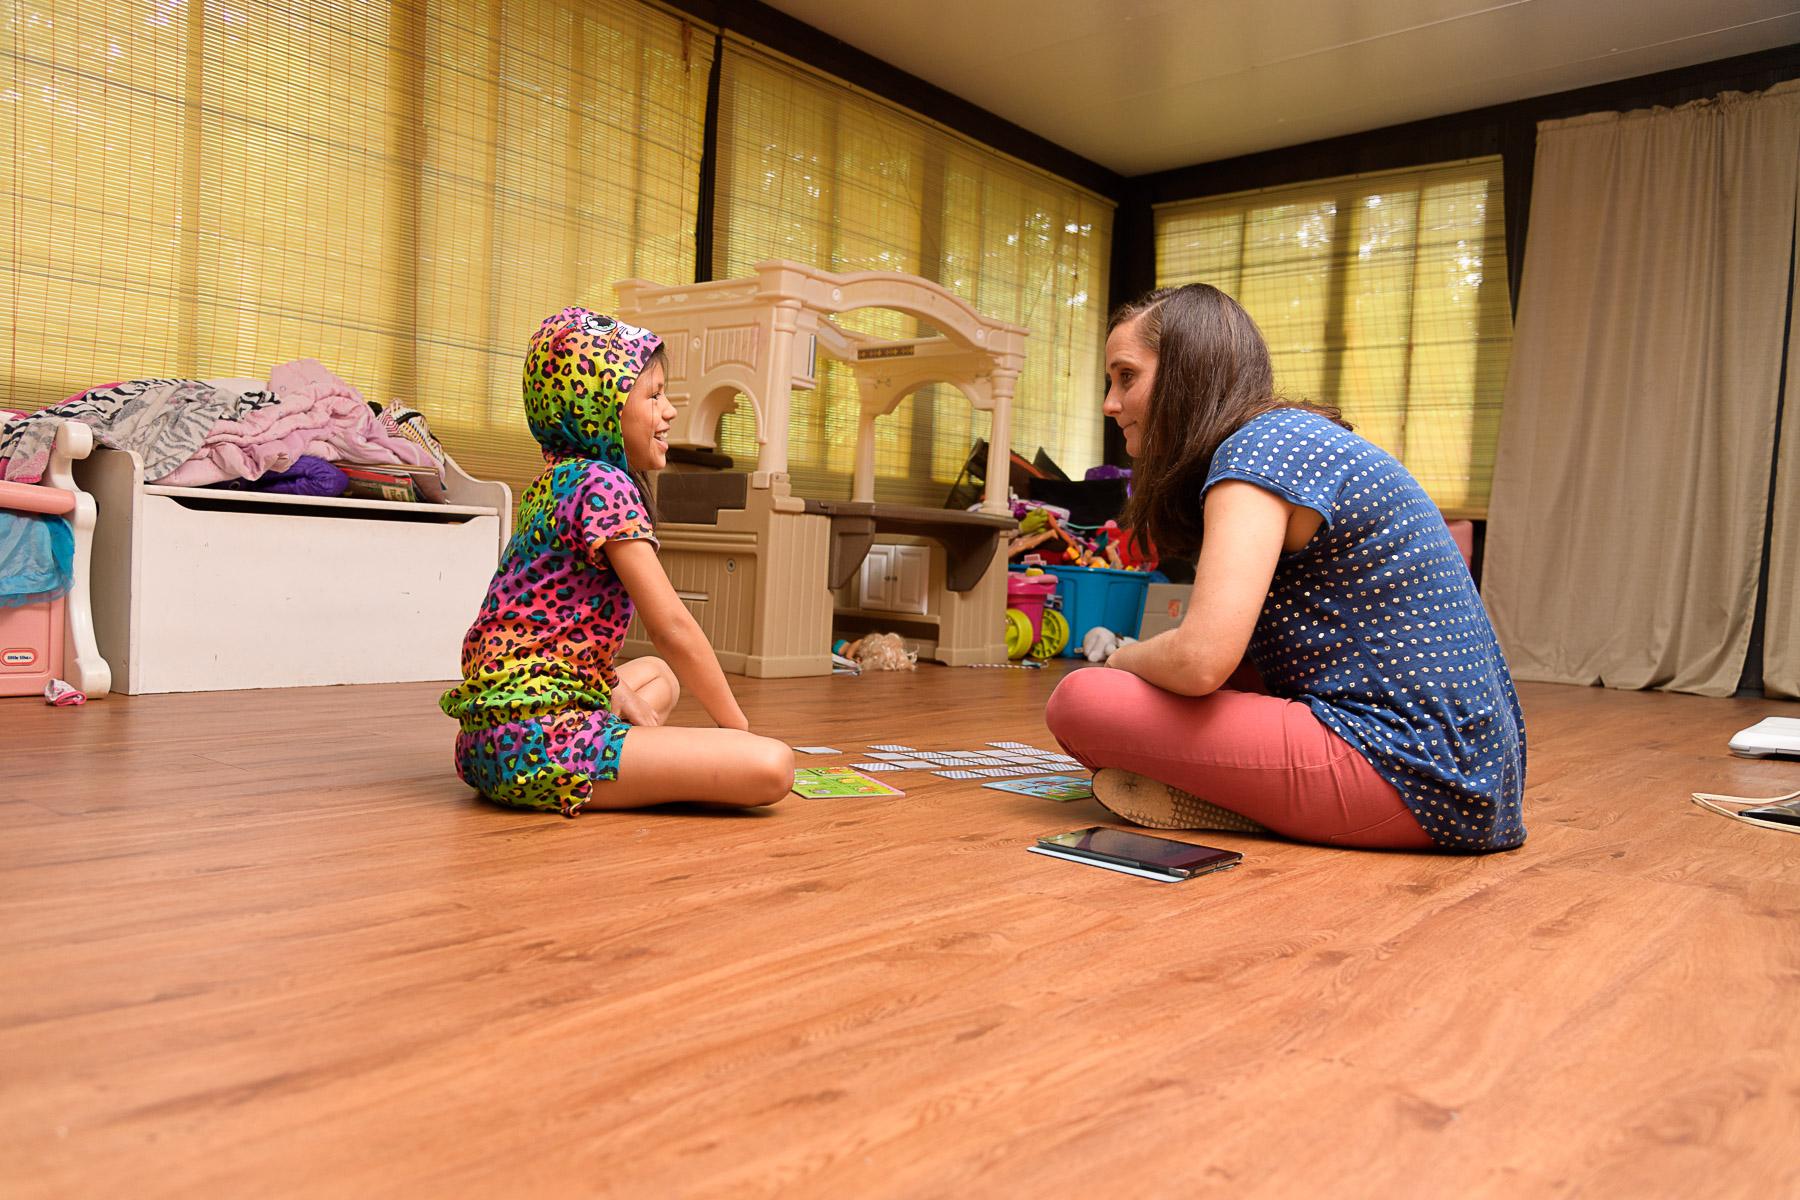 Pediatric Speech Therapy Services - Cheshire Center